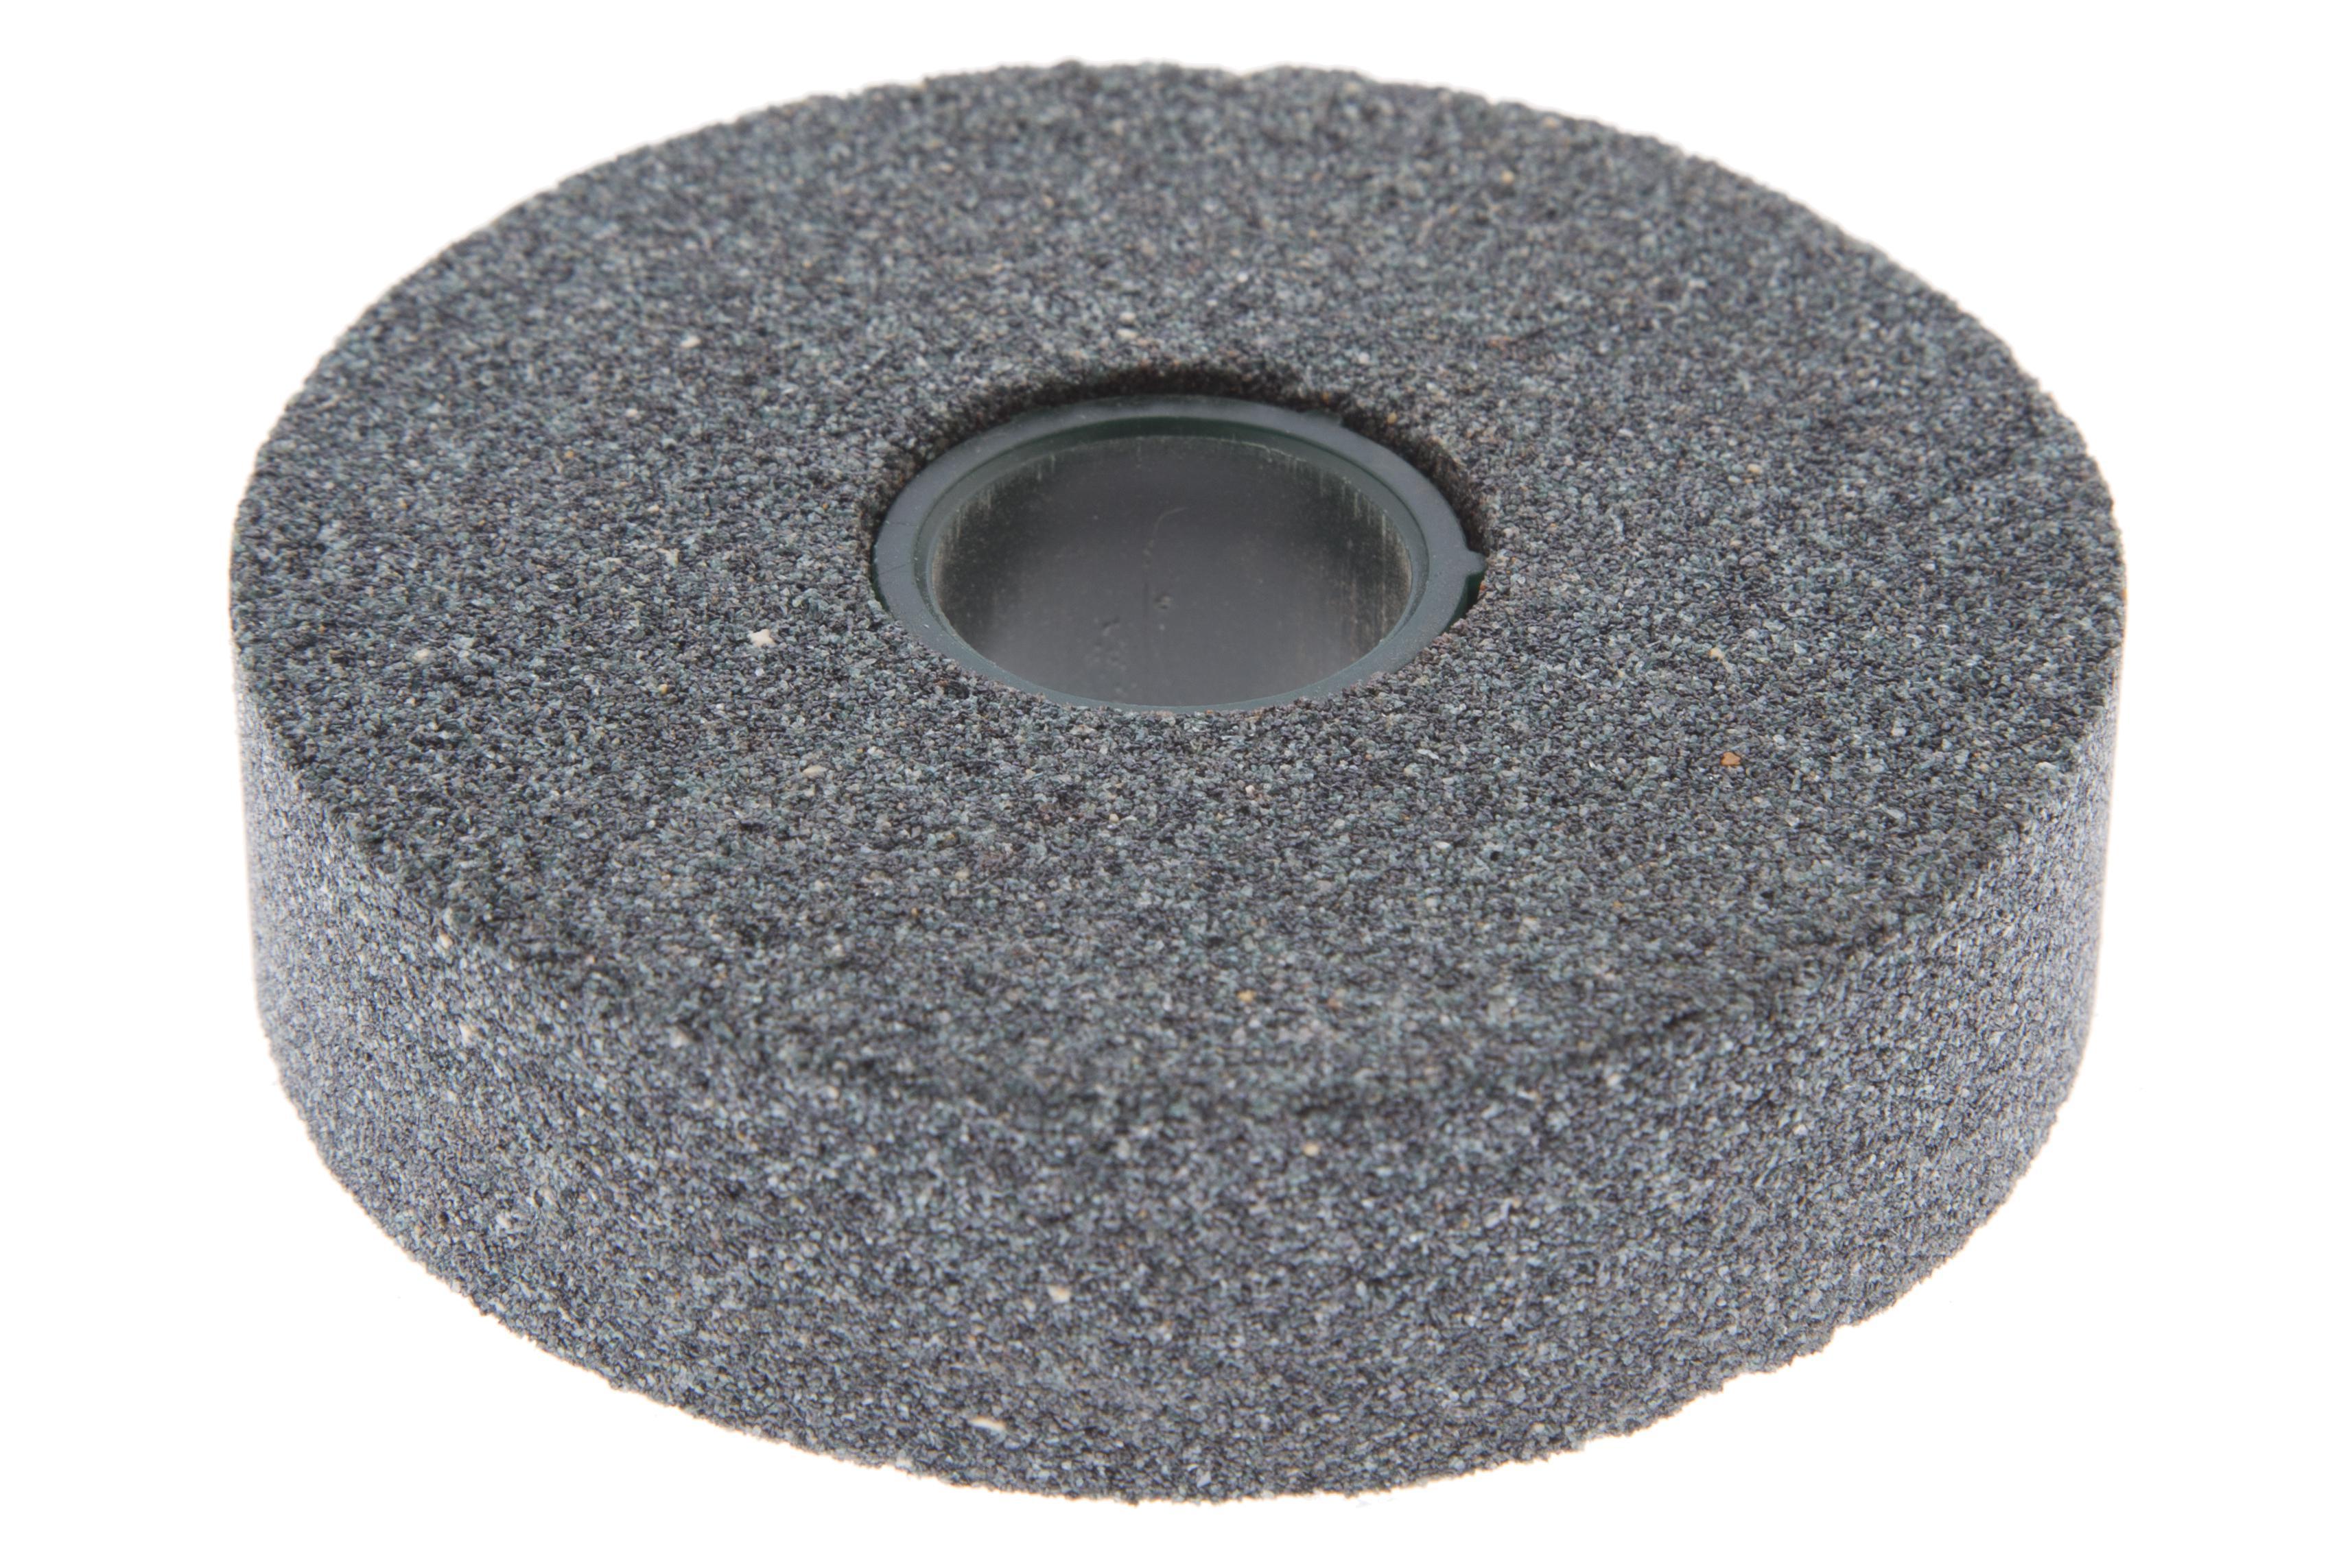 Круг шлифовальный ЛУГА-АБРАЗИВ 1 80 Х 20 Х 20 63С 60 k,l (25СМ) ваза mughal l 20 х 20 х 30 см